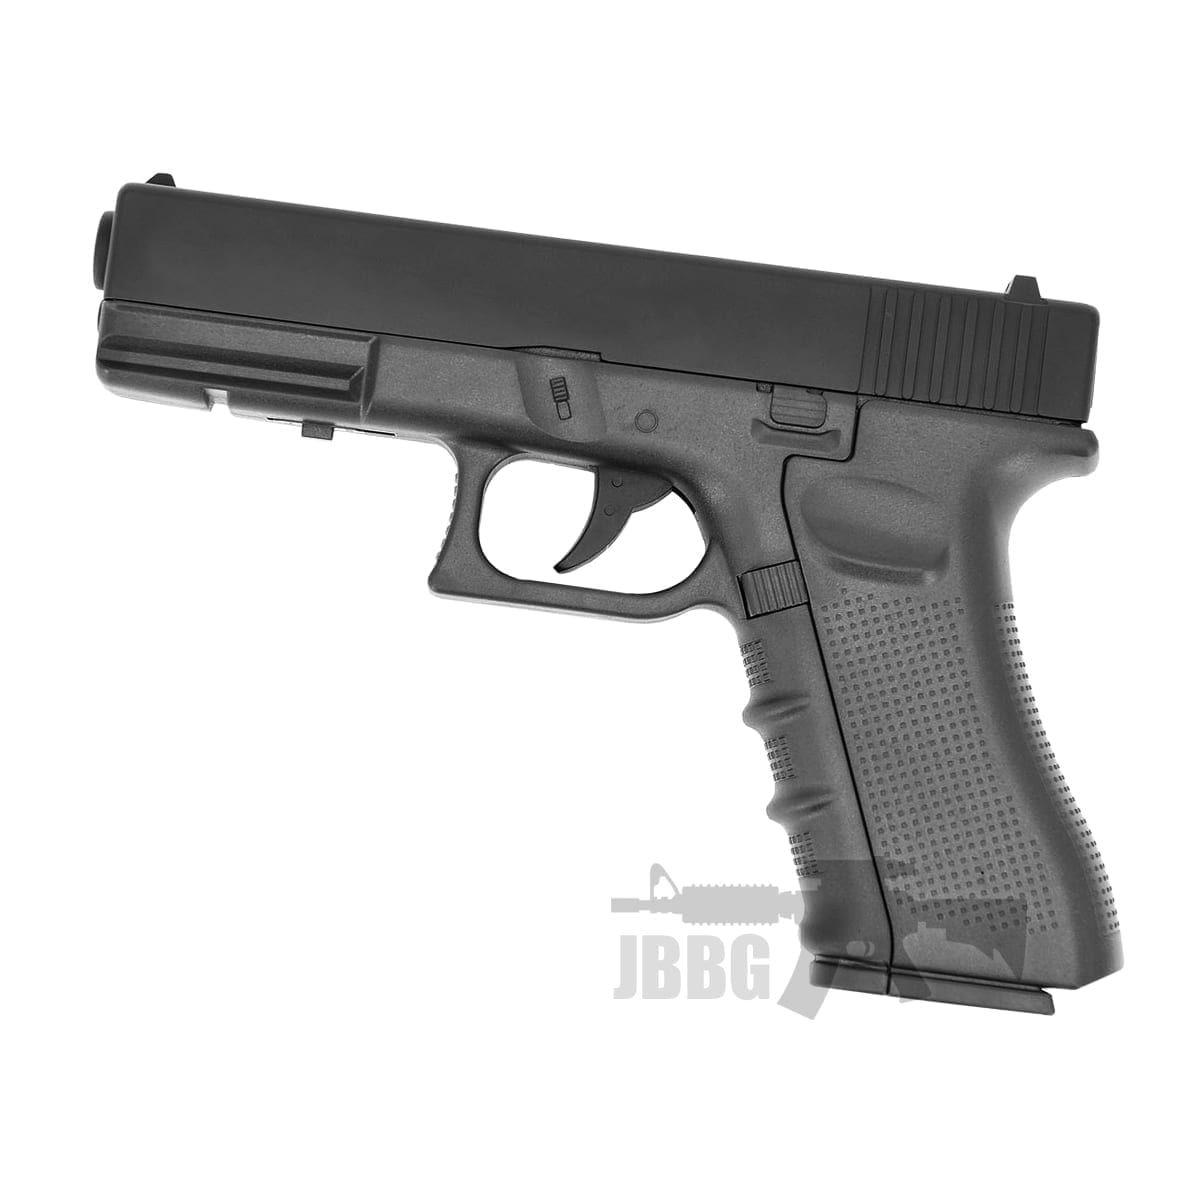 TX R17 Metal Slide Co2 4.5 Air Pistol